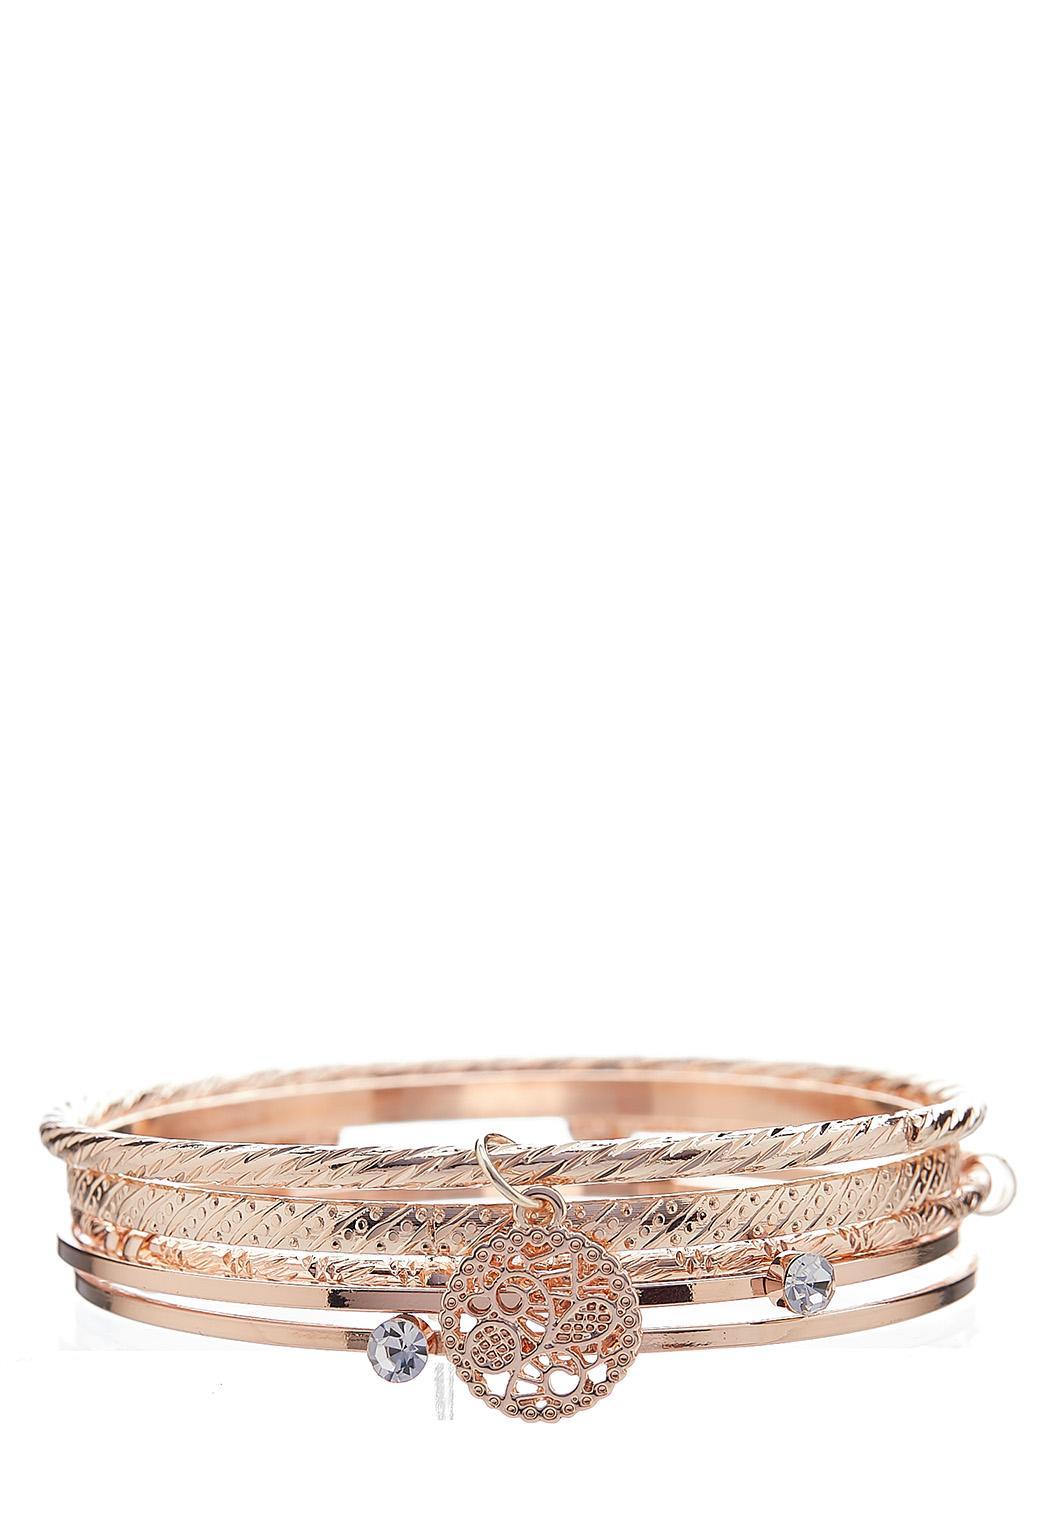 XL Gold Bangle Bracelet Set